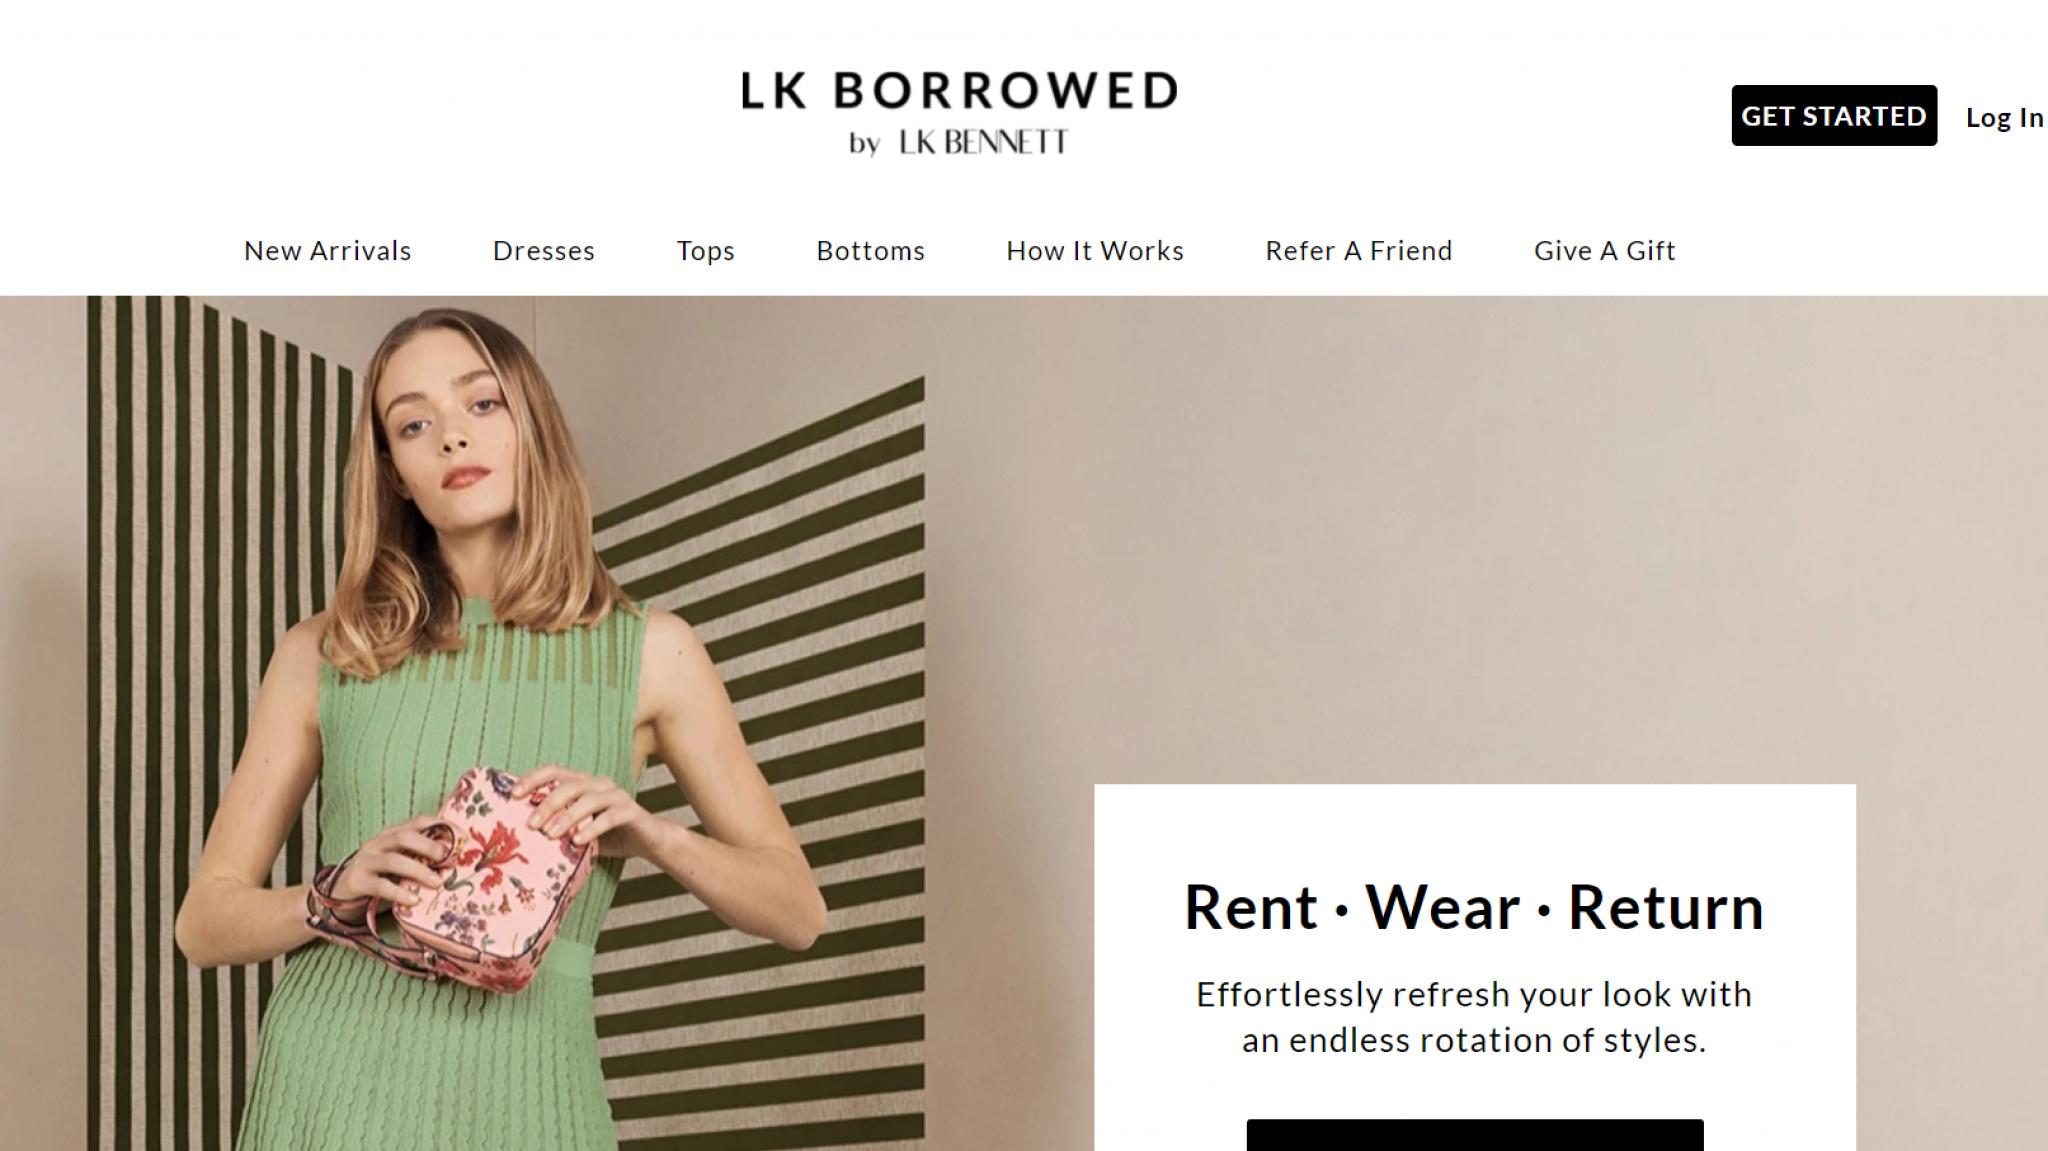 LK Bennett launches clothing rental service